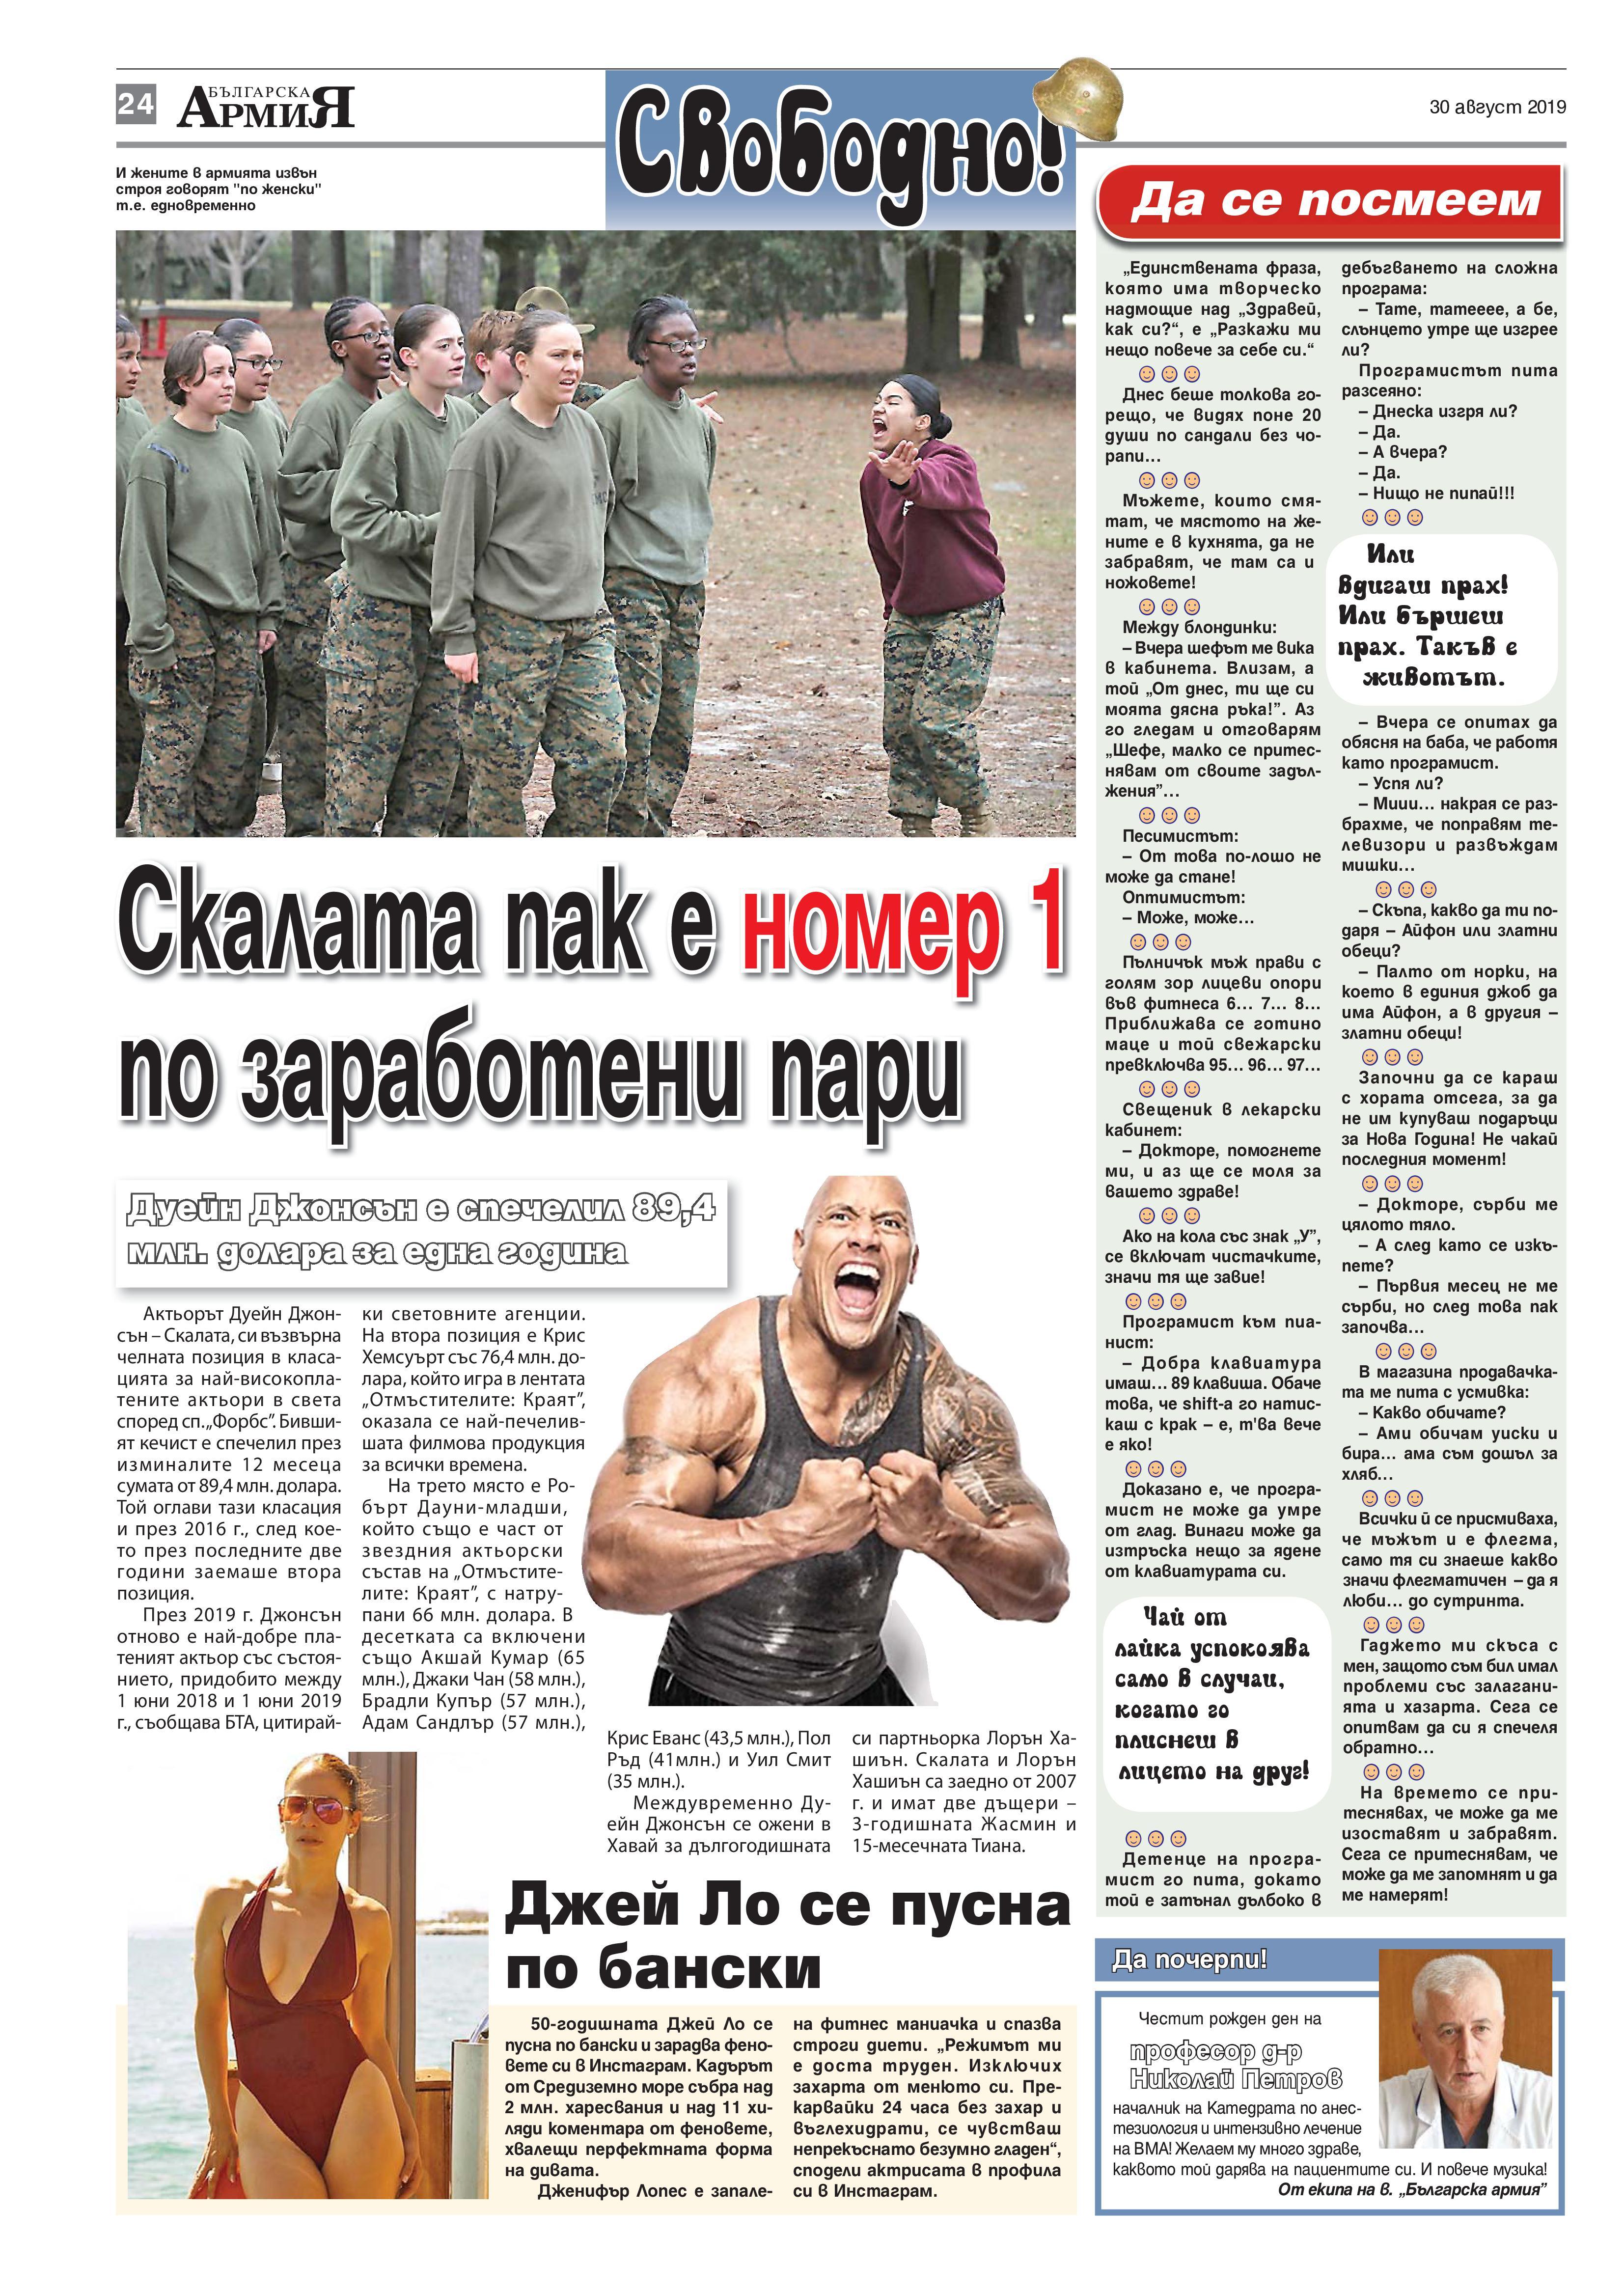 https://armymedia.bg/wp-content/uploads/2015/06/24-31.jpg